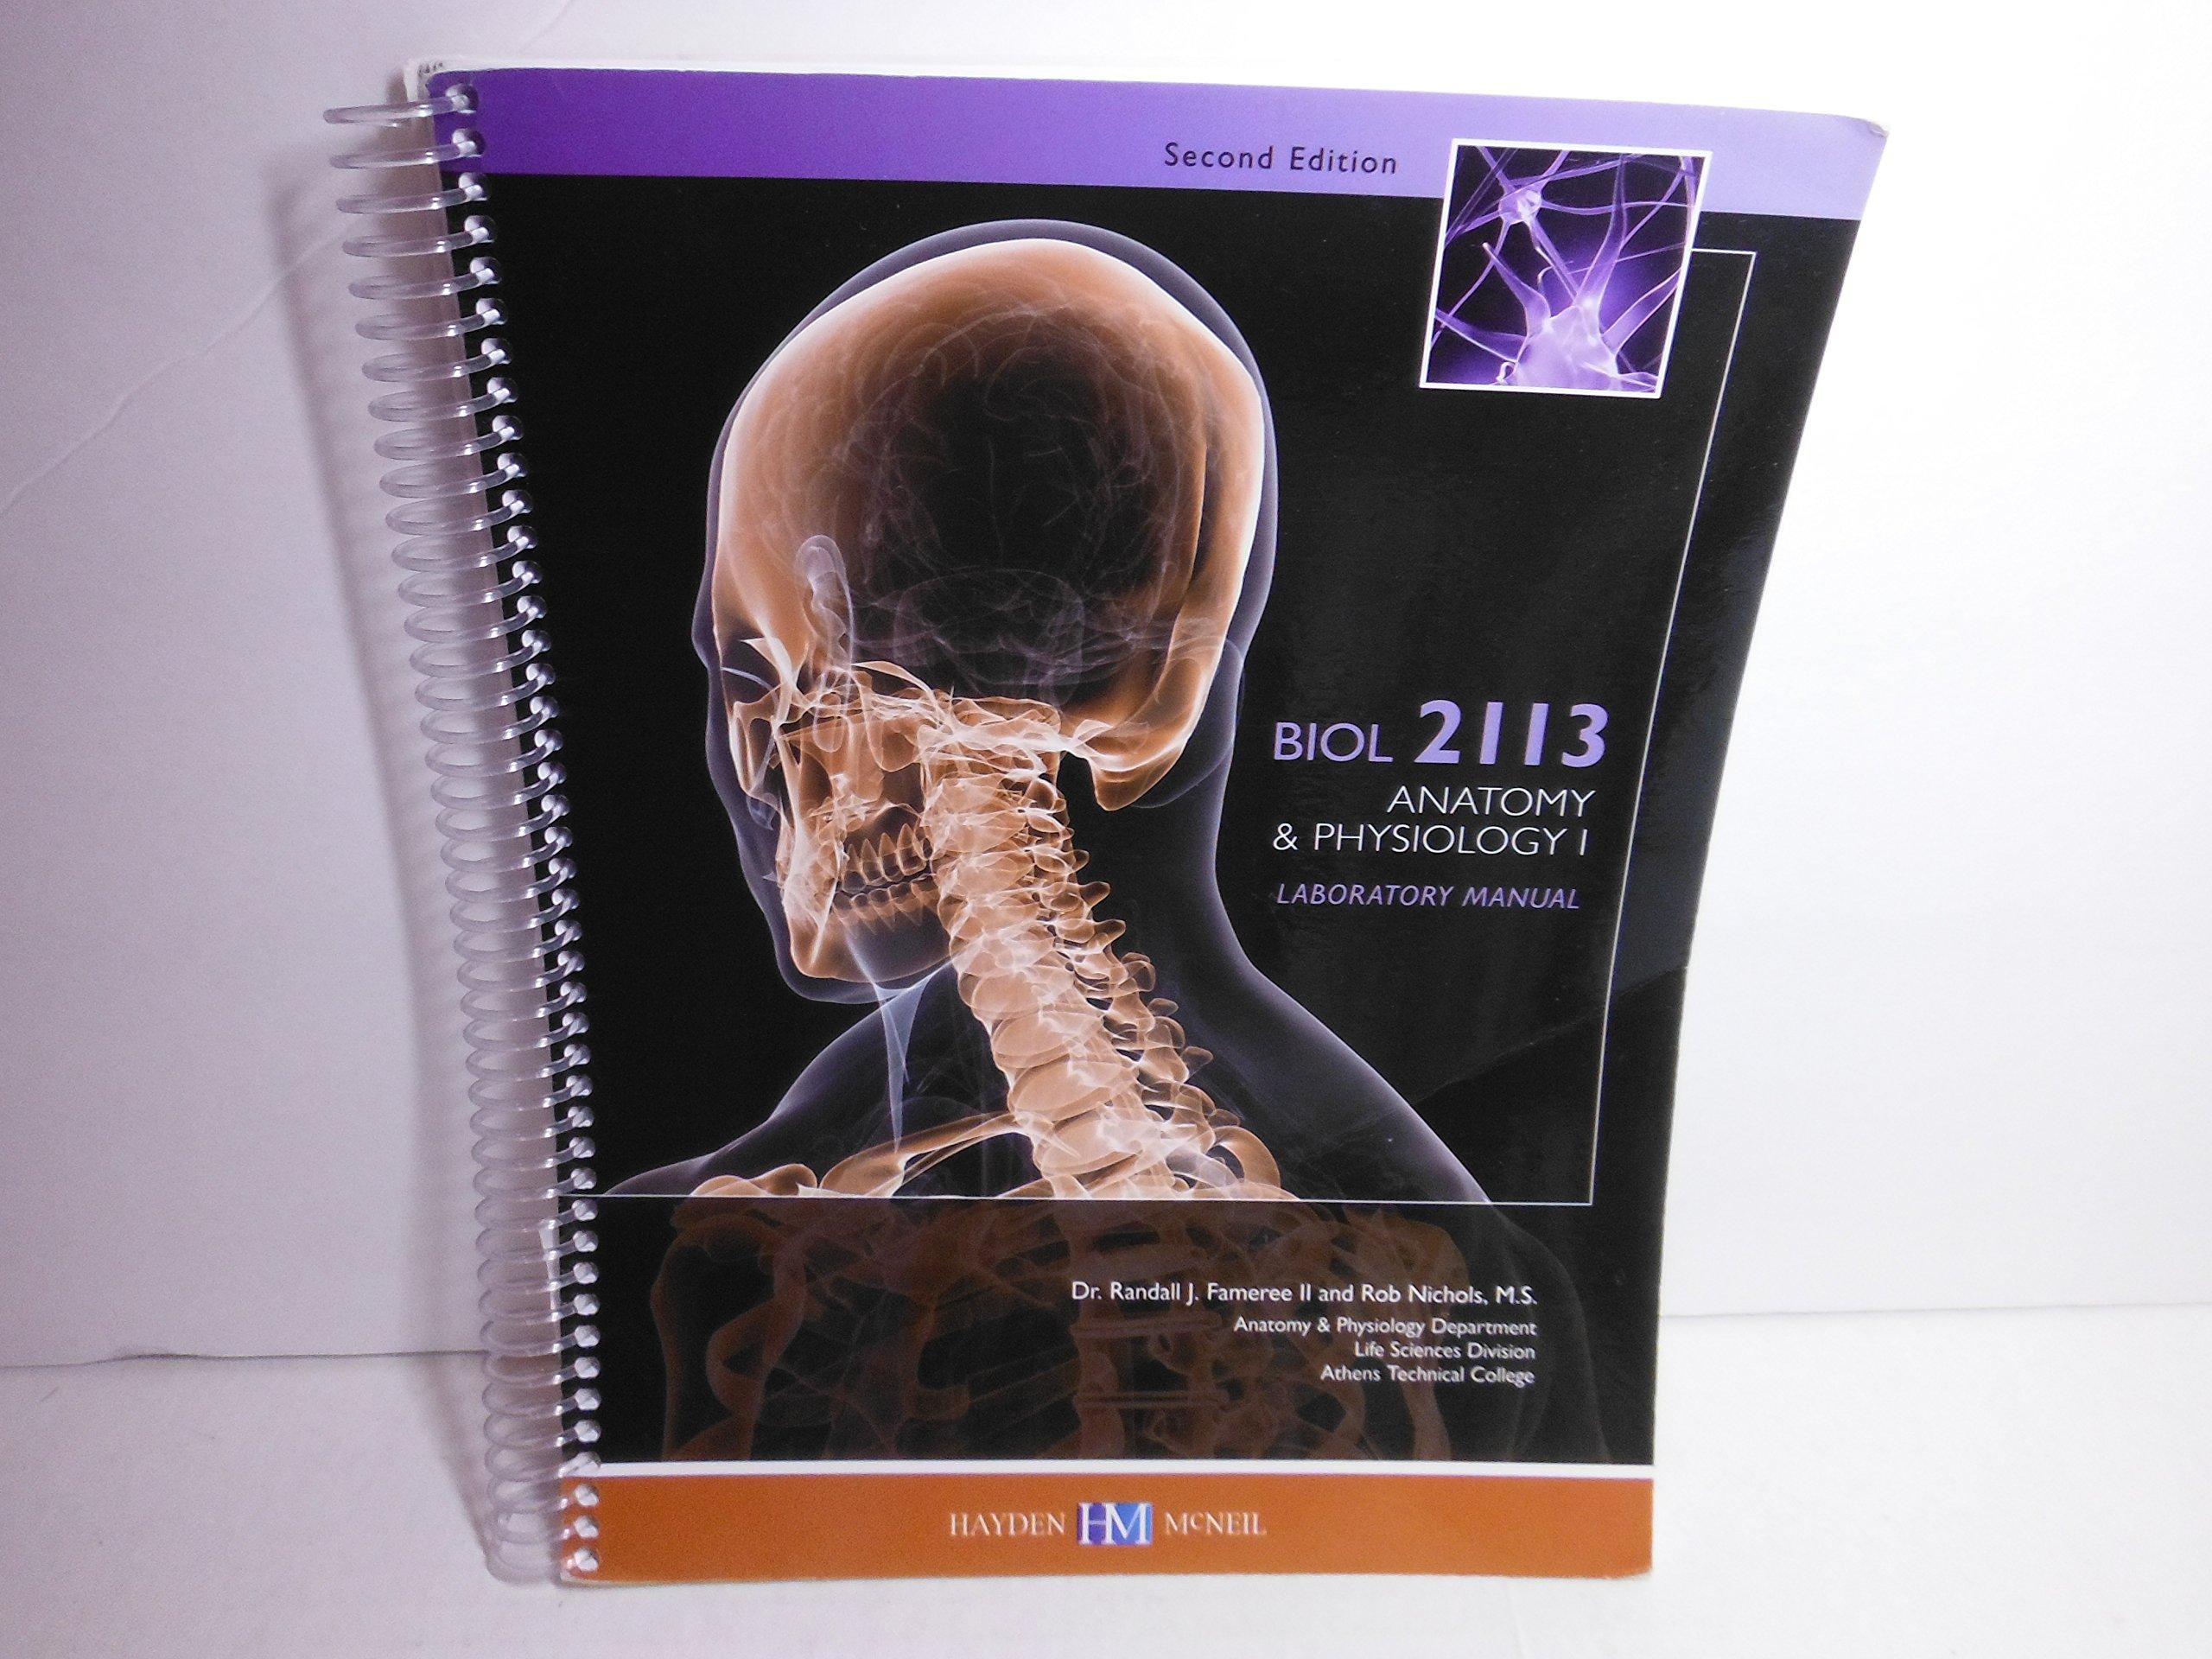 BIOL 2113 Anatomy & Physiology 1 Lab Manual (Athens Tech): M.S. Dr ...